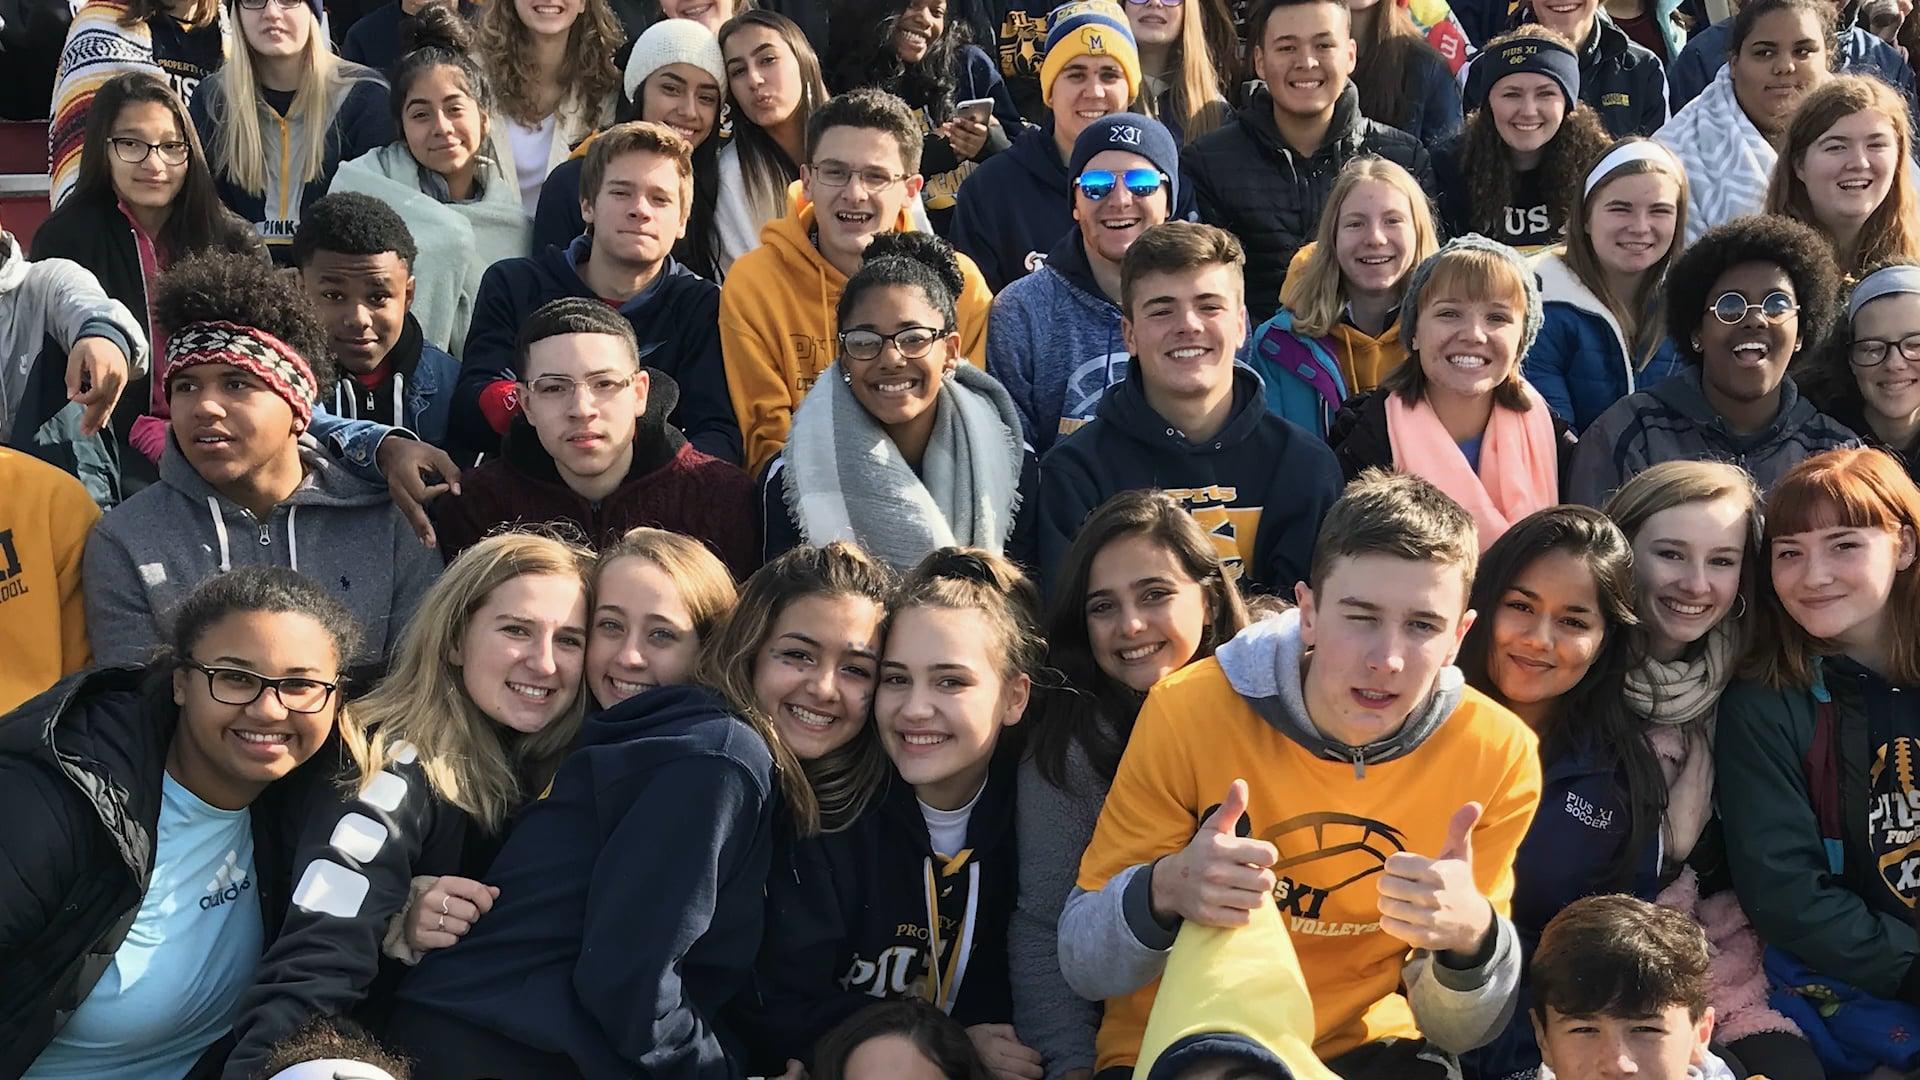 The Best of Us - Pius XI High School